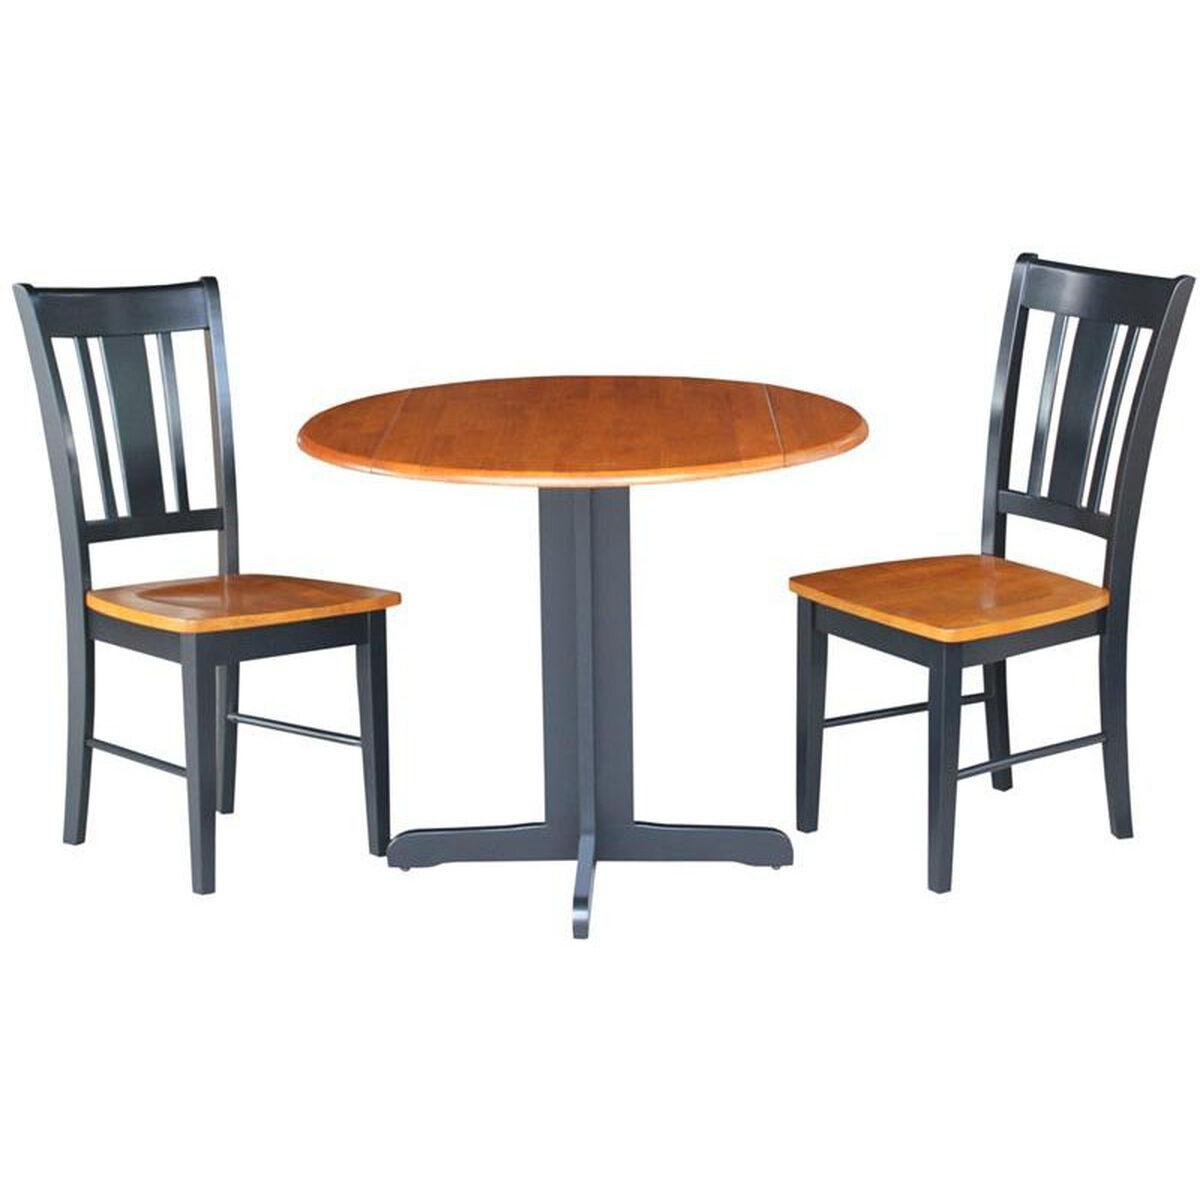 Parawood Three Piece Table Set KRPCP Bizchaircom - 36 diameter dining table